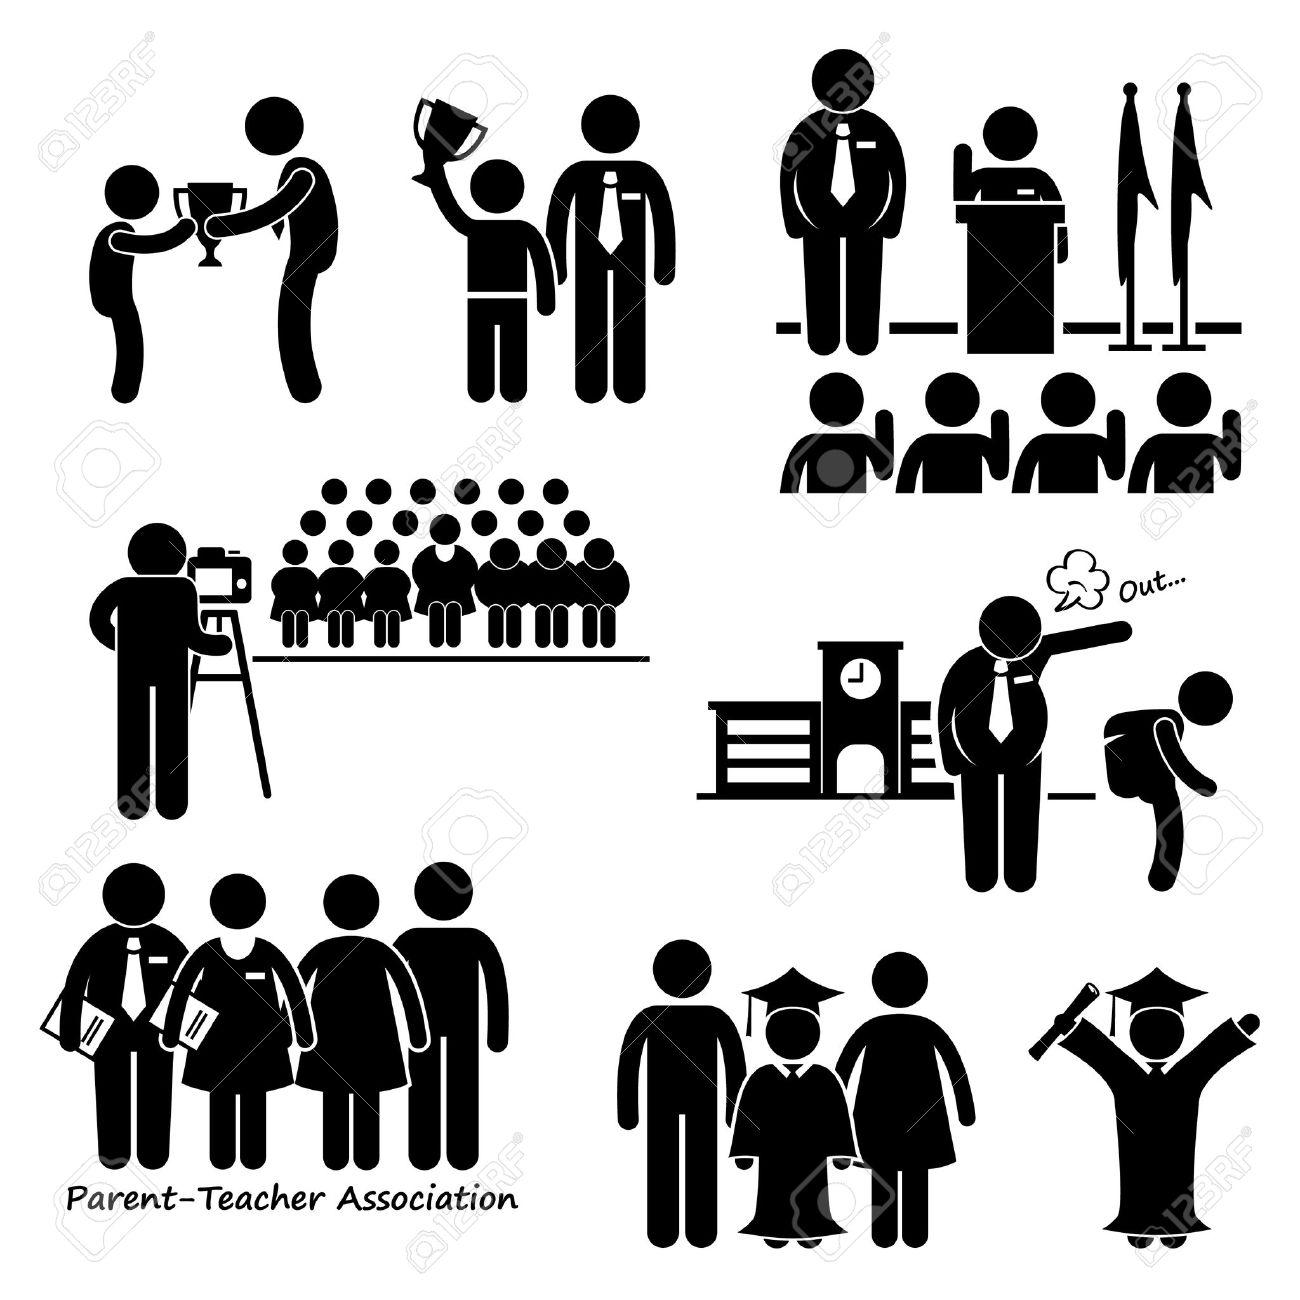 hight resolution of school events award assembly pledge photo session expel parent teacher association